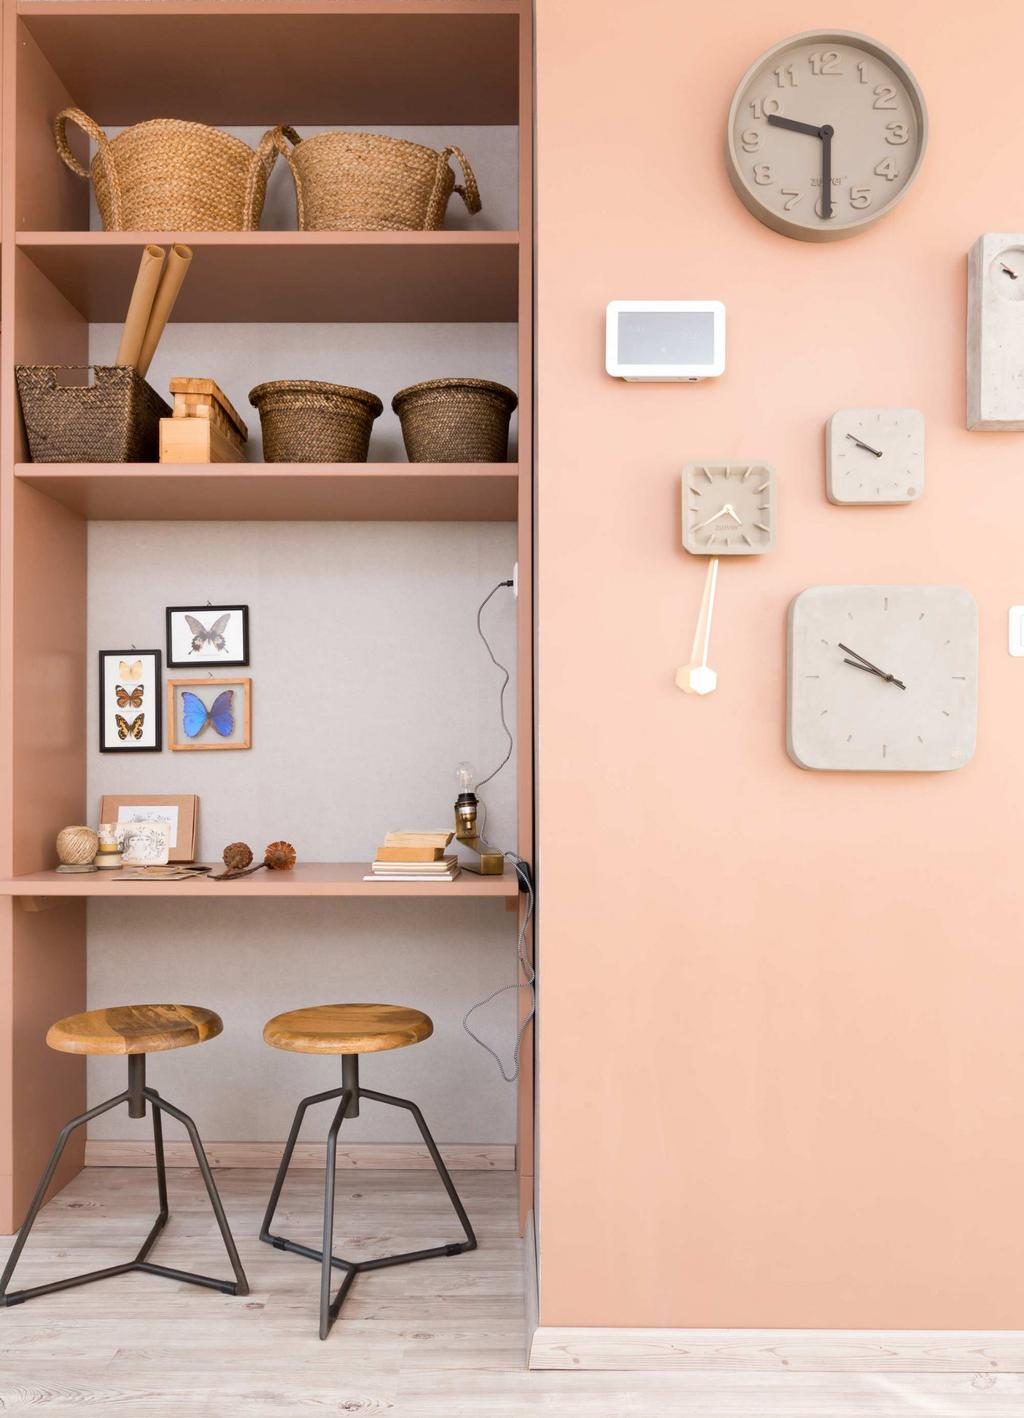 horloges-sur-mur-rose